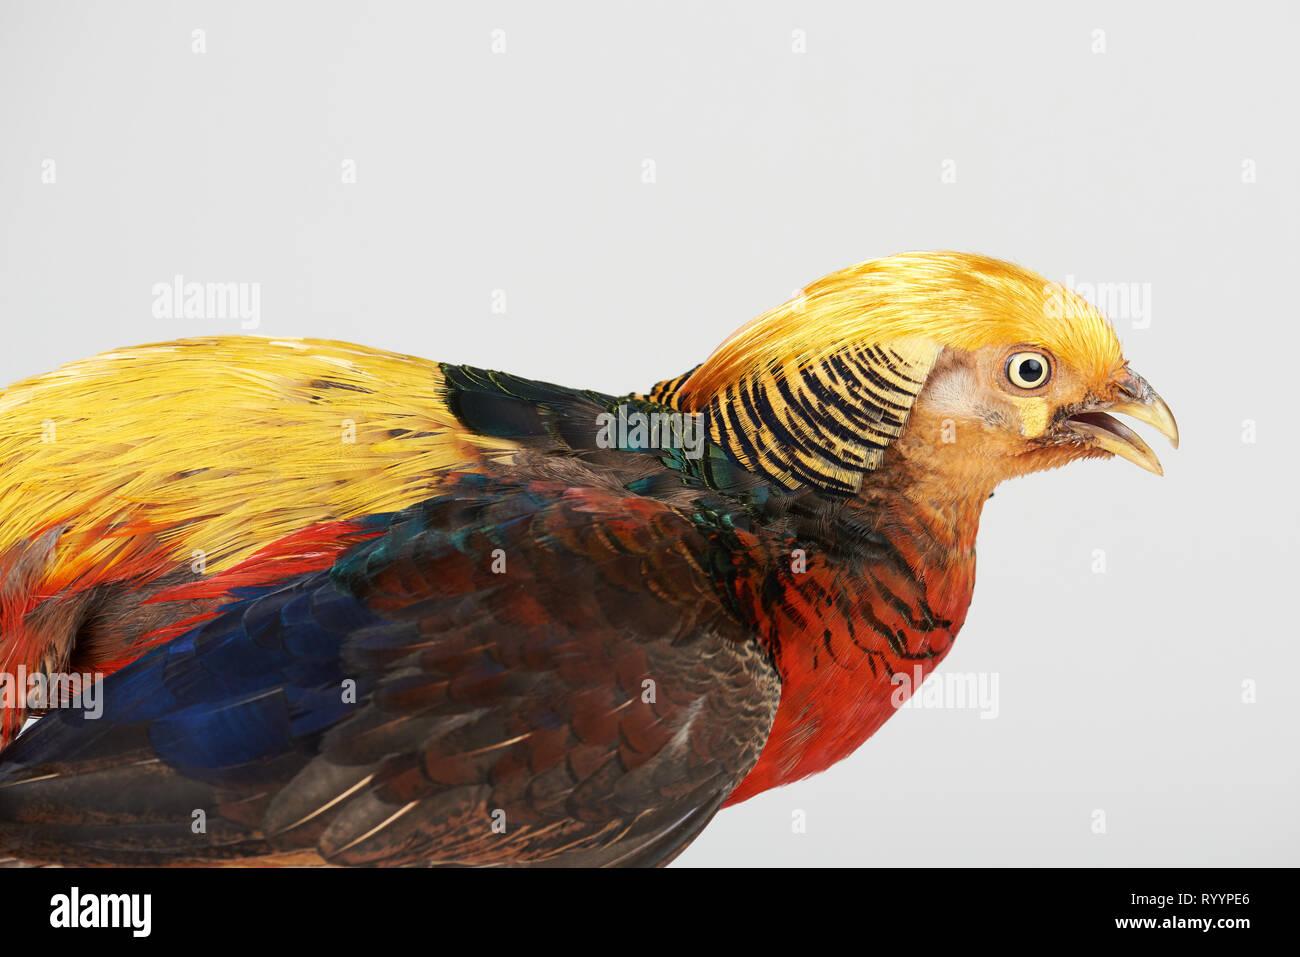 Colorful pheasant bird isolated on white studio background - Stock Image